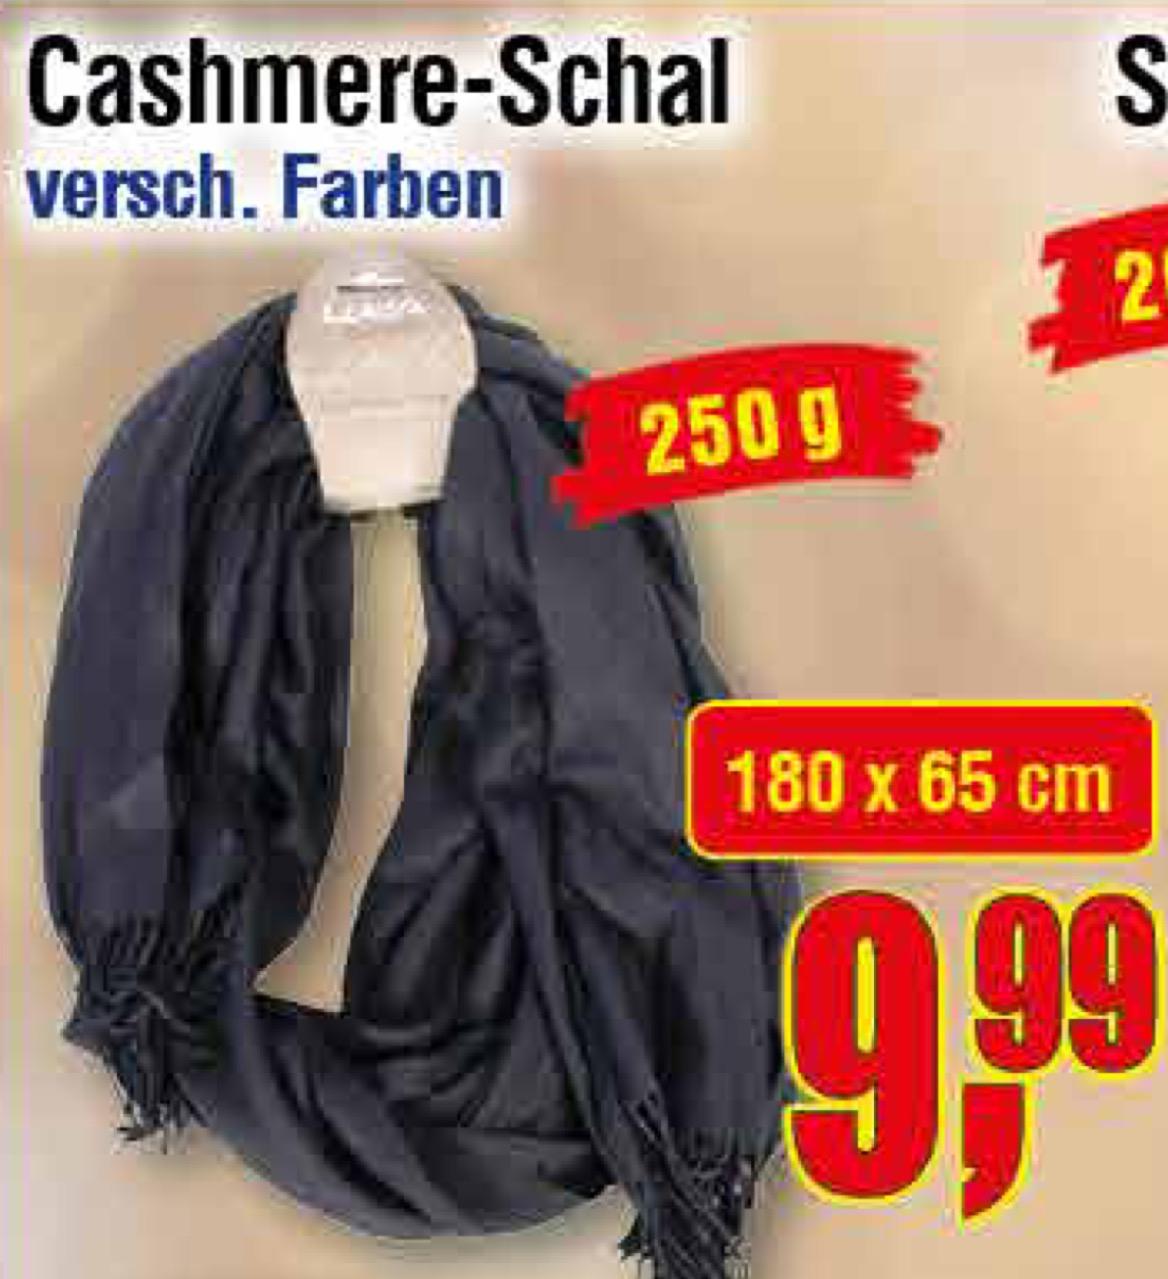 [Centershop] Cashmere Schal 9,99€